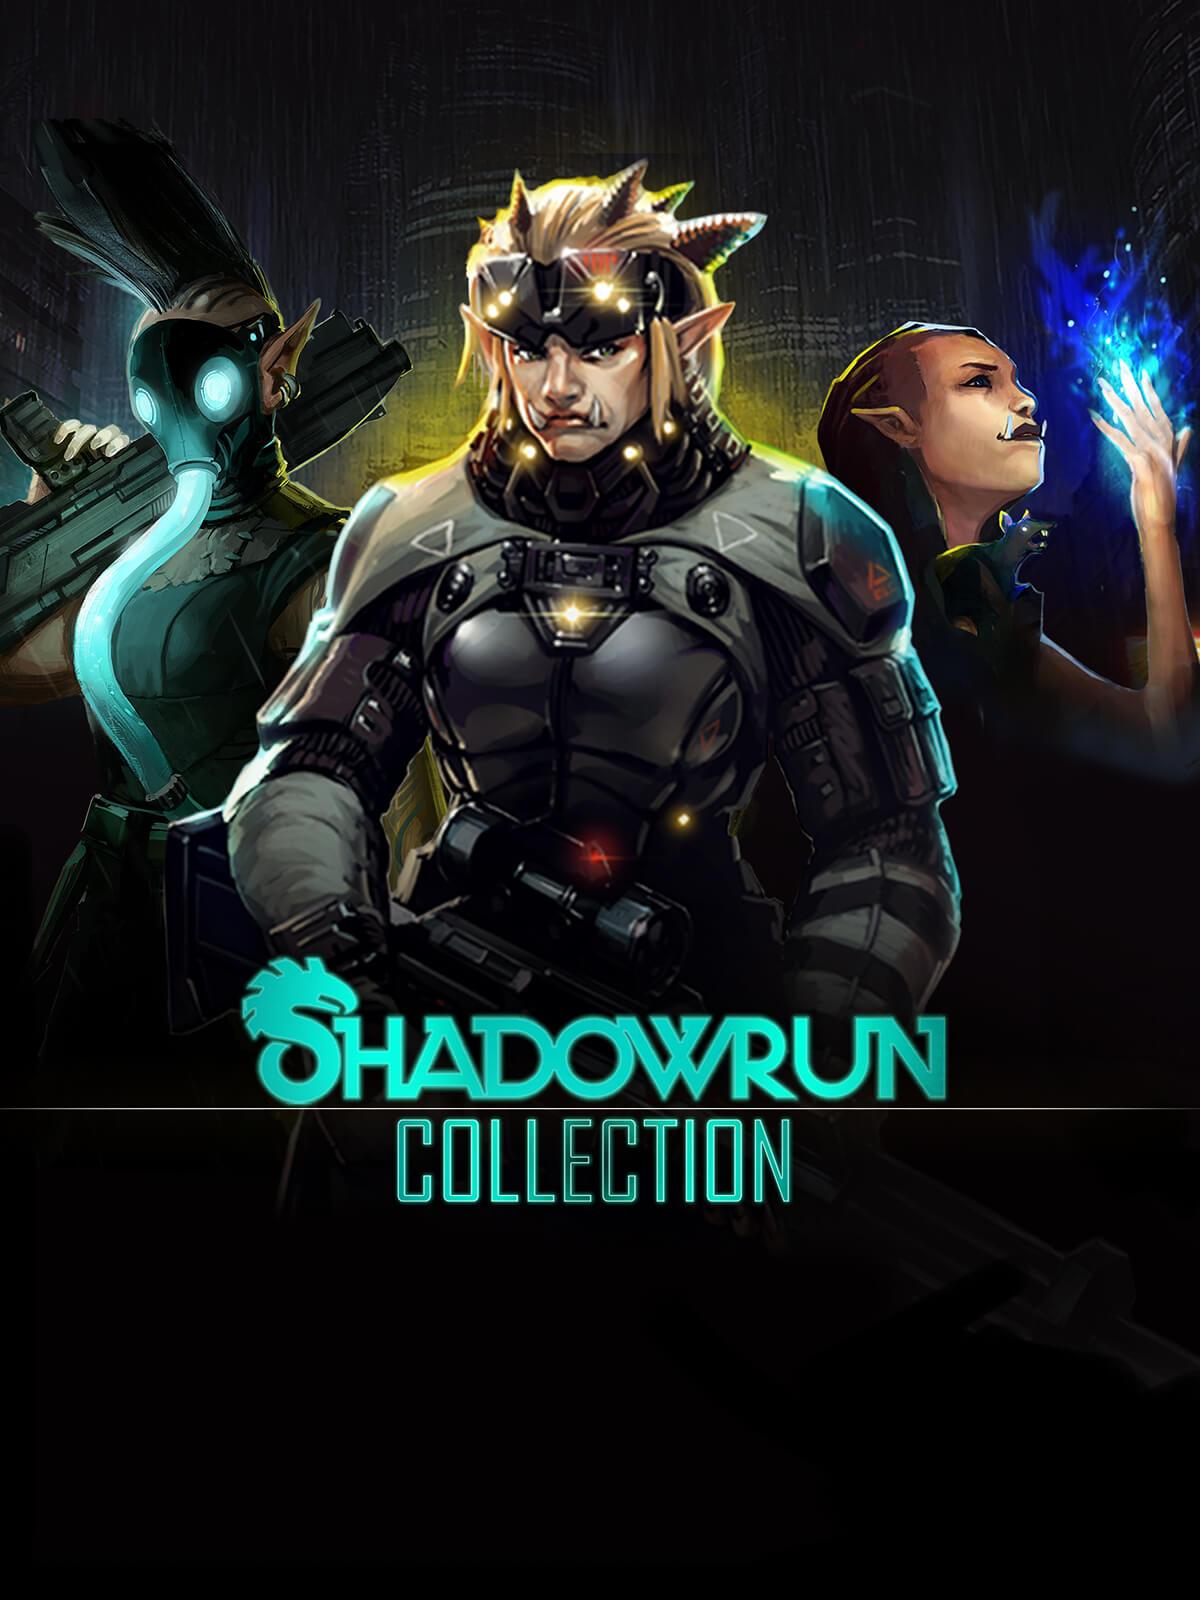 Shadowrun Collection